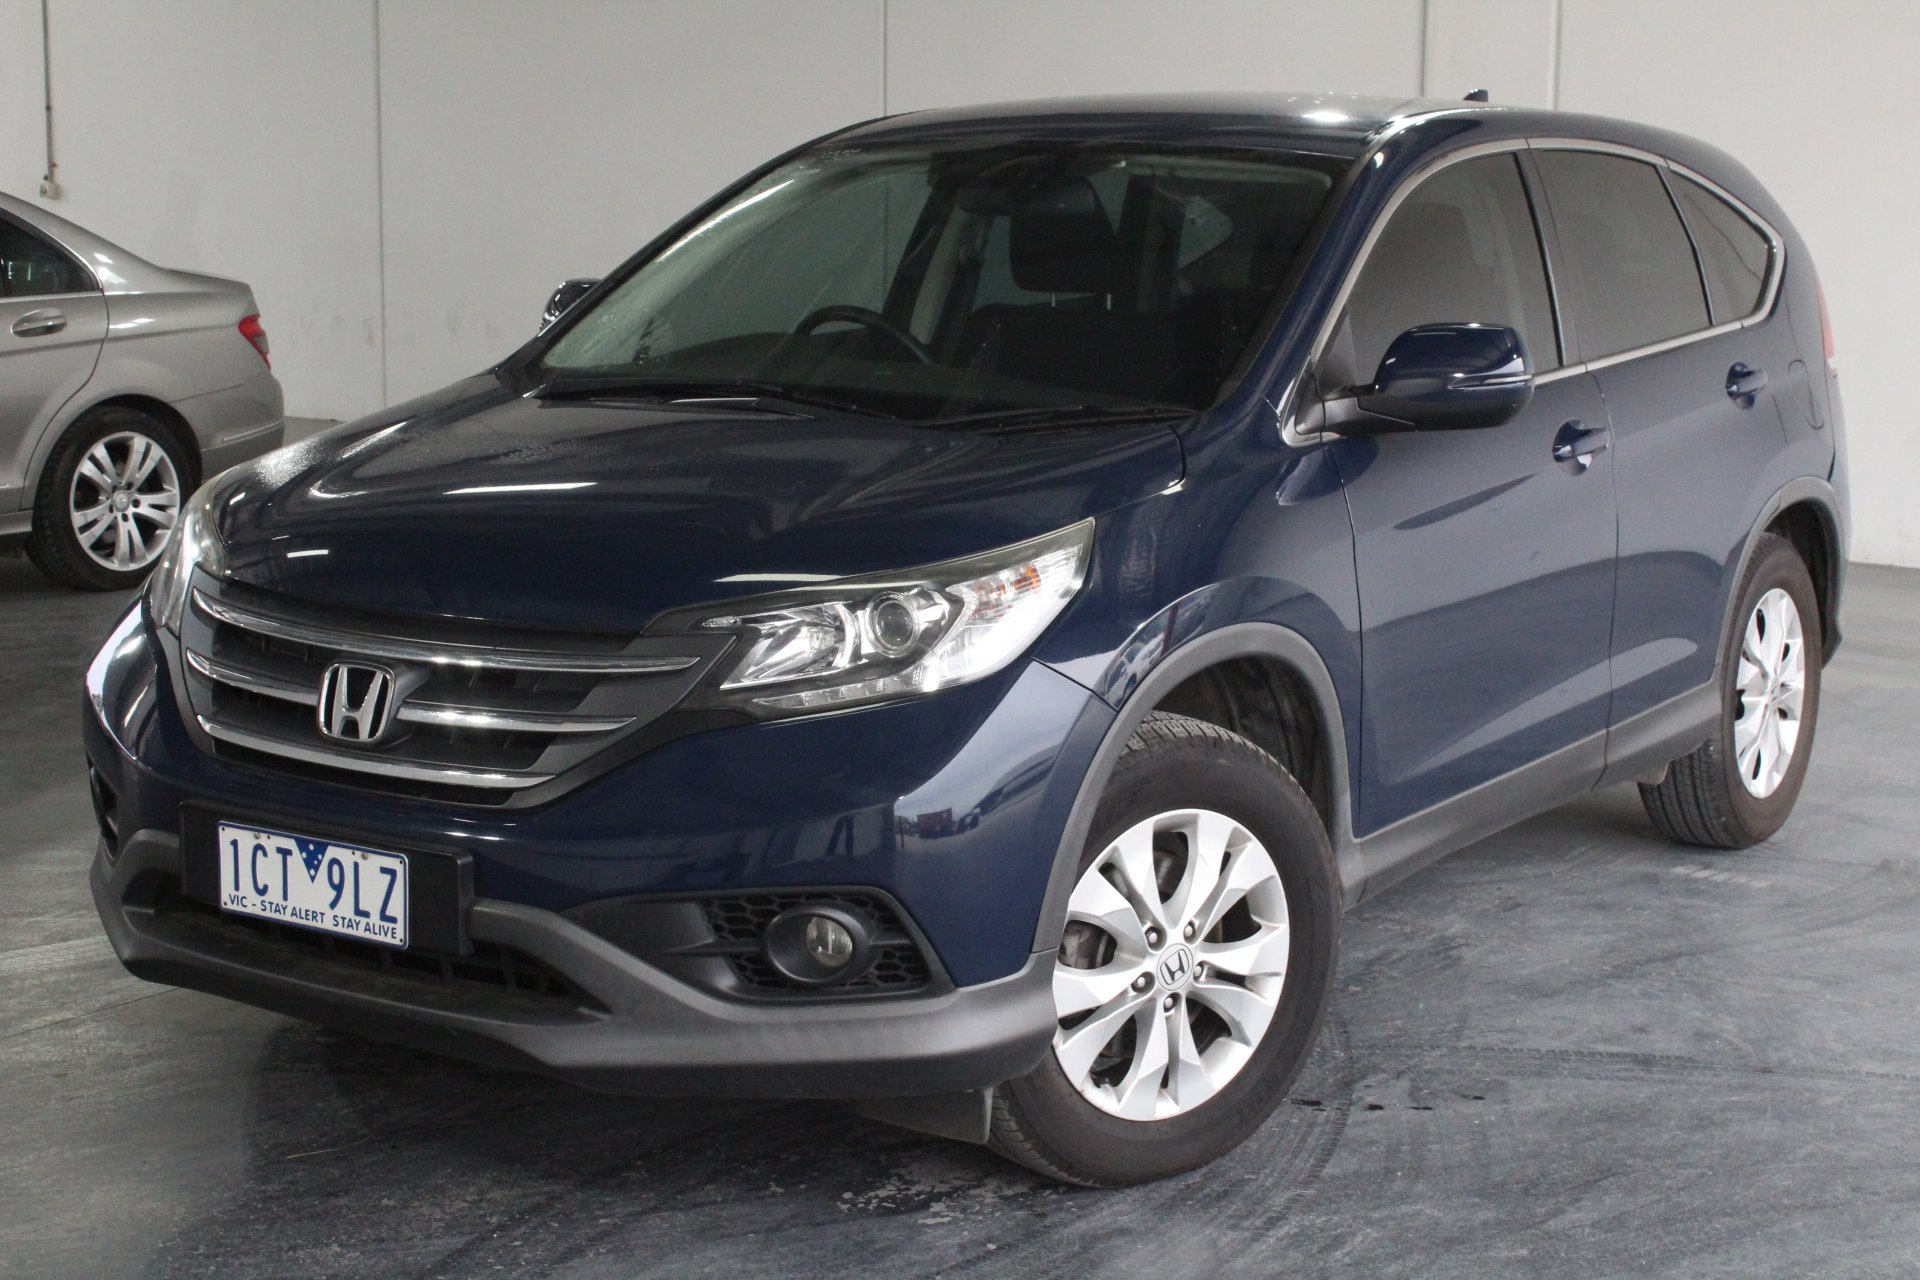 2014 Honda CR-V 4WD DTi-S RM Turbo Diesel Automatic Wagon